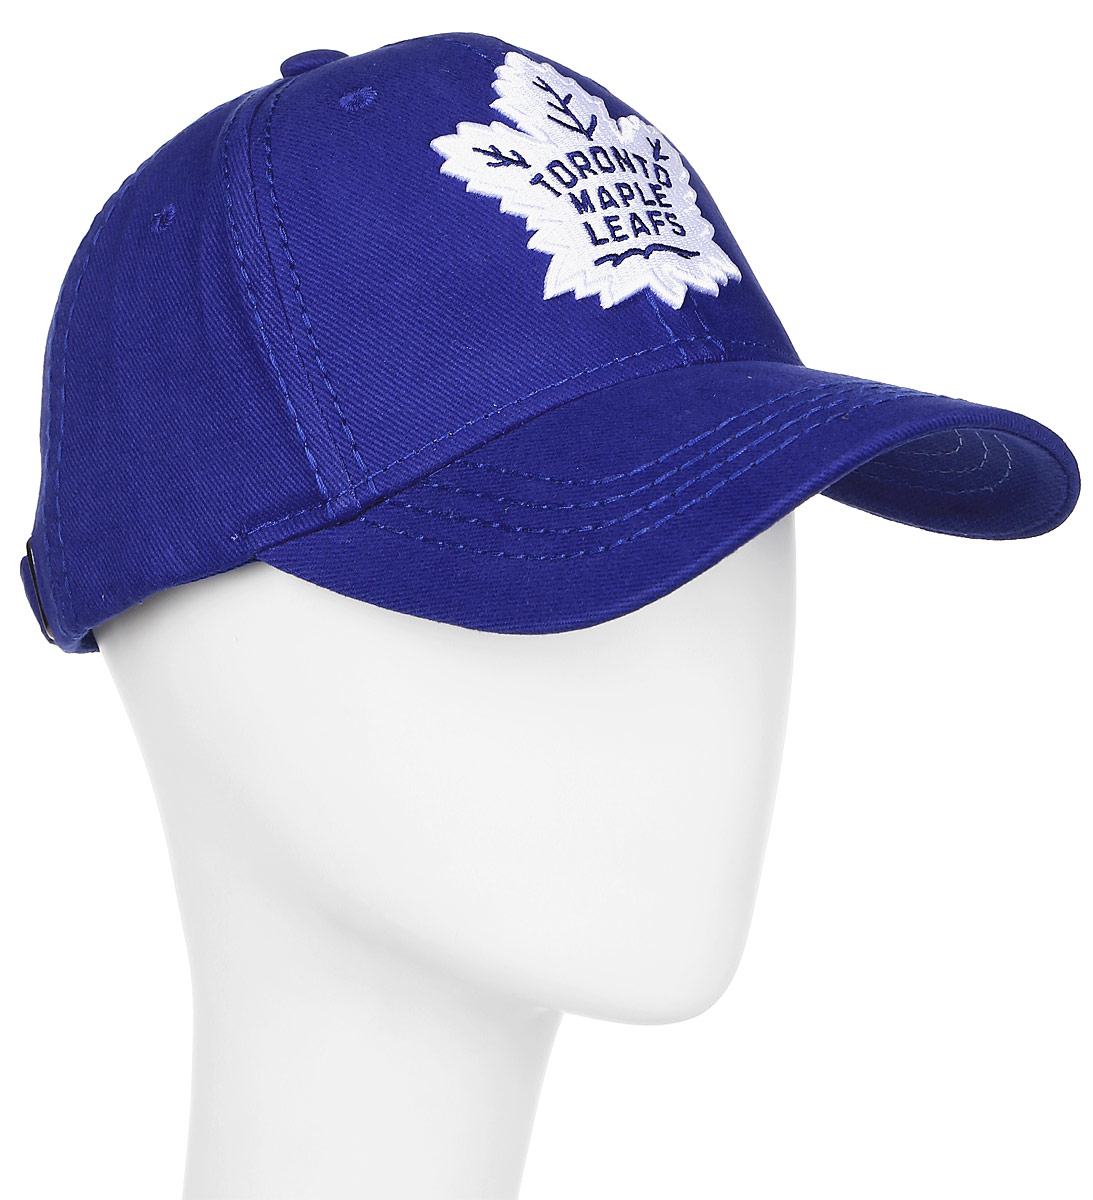 Бейсболка детская Atributika & Club Toronto Maple Leafs, цвет: синий. 29087. Размер 52/54